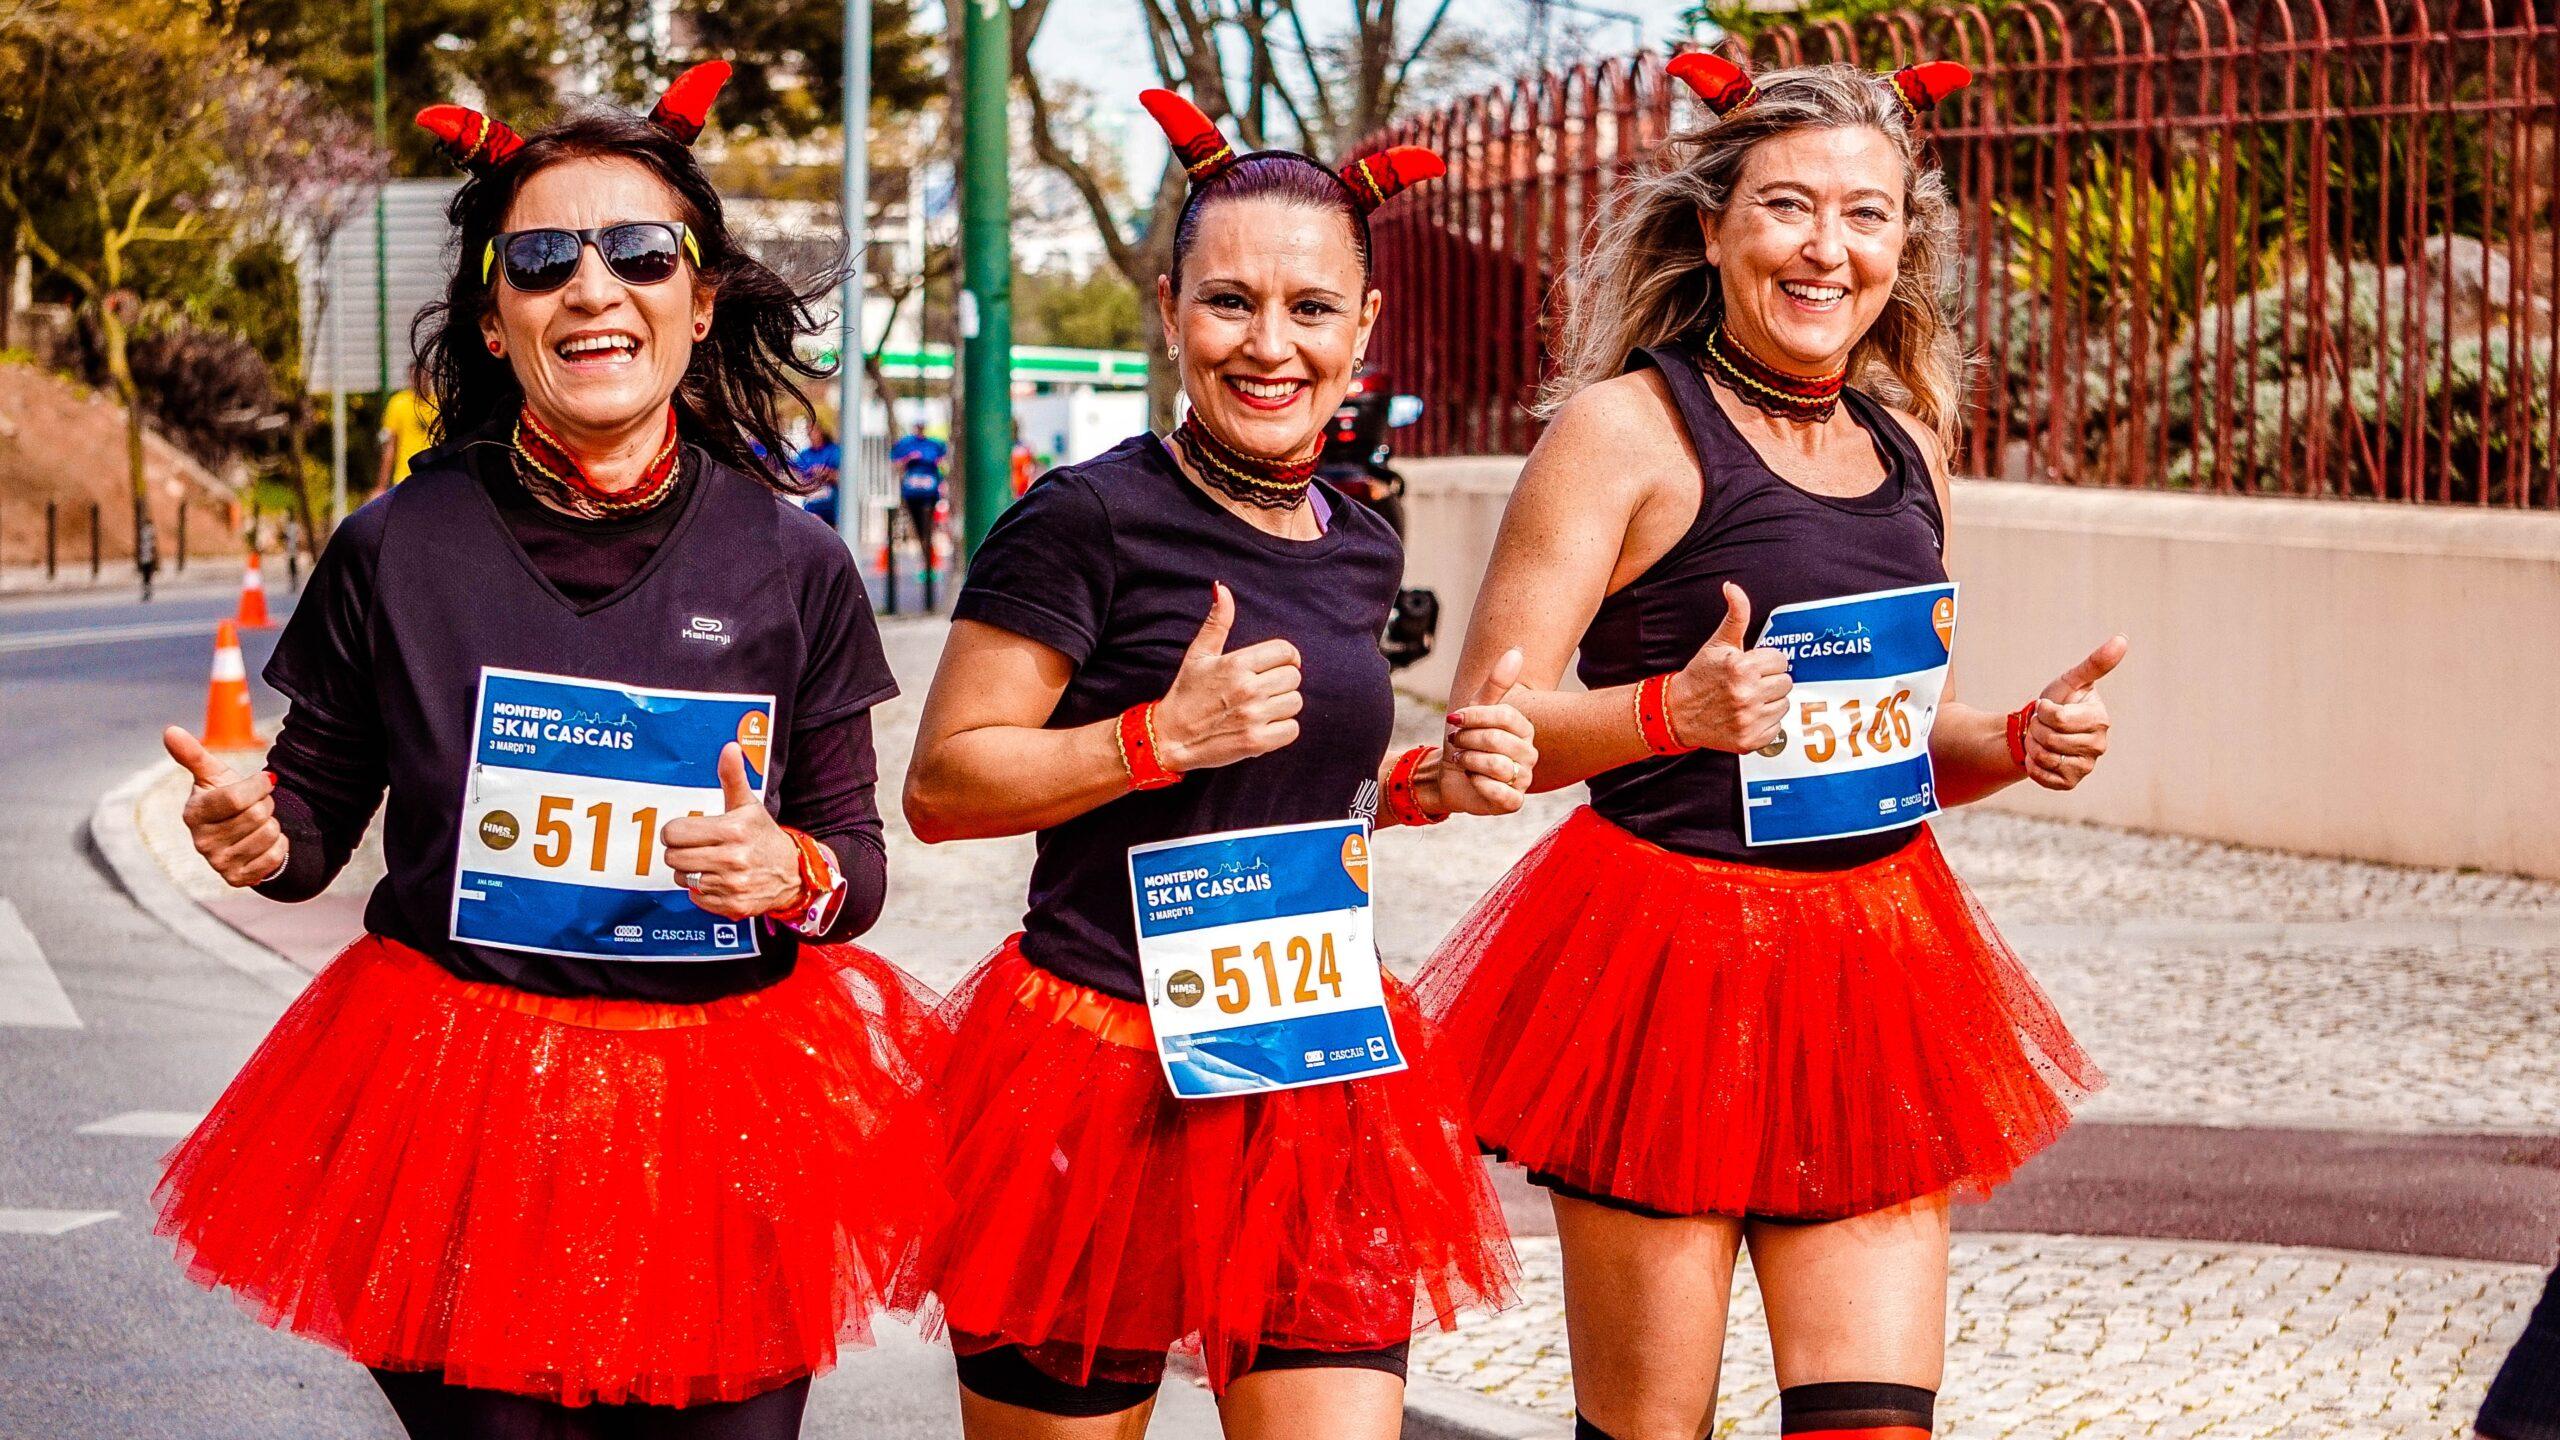 women walking in fundraising event